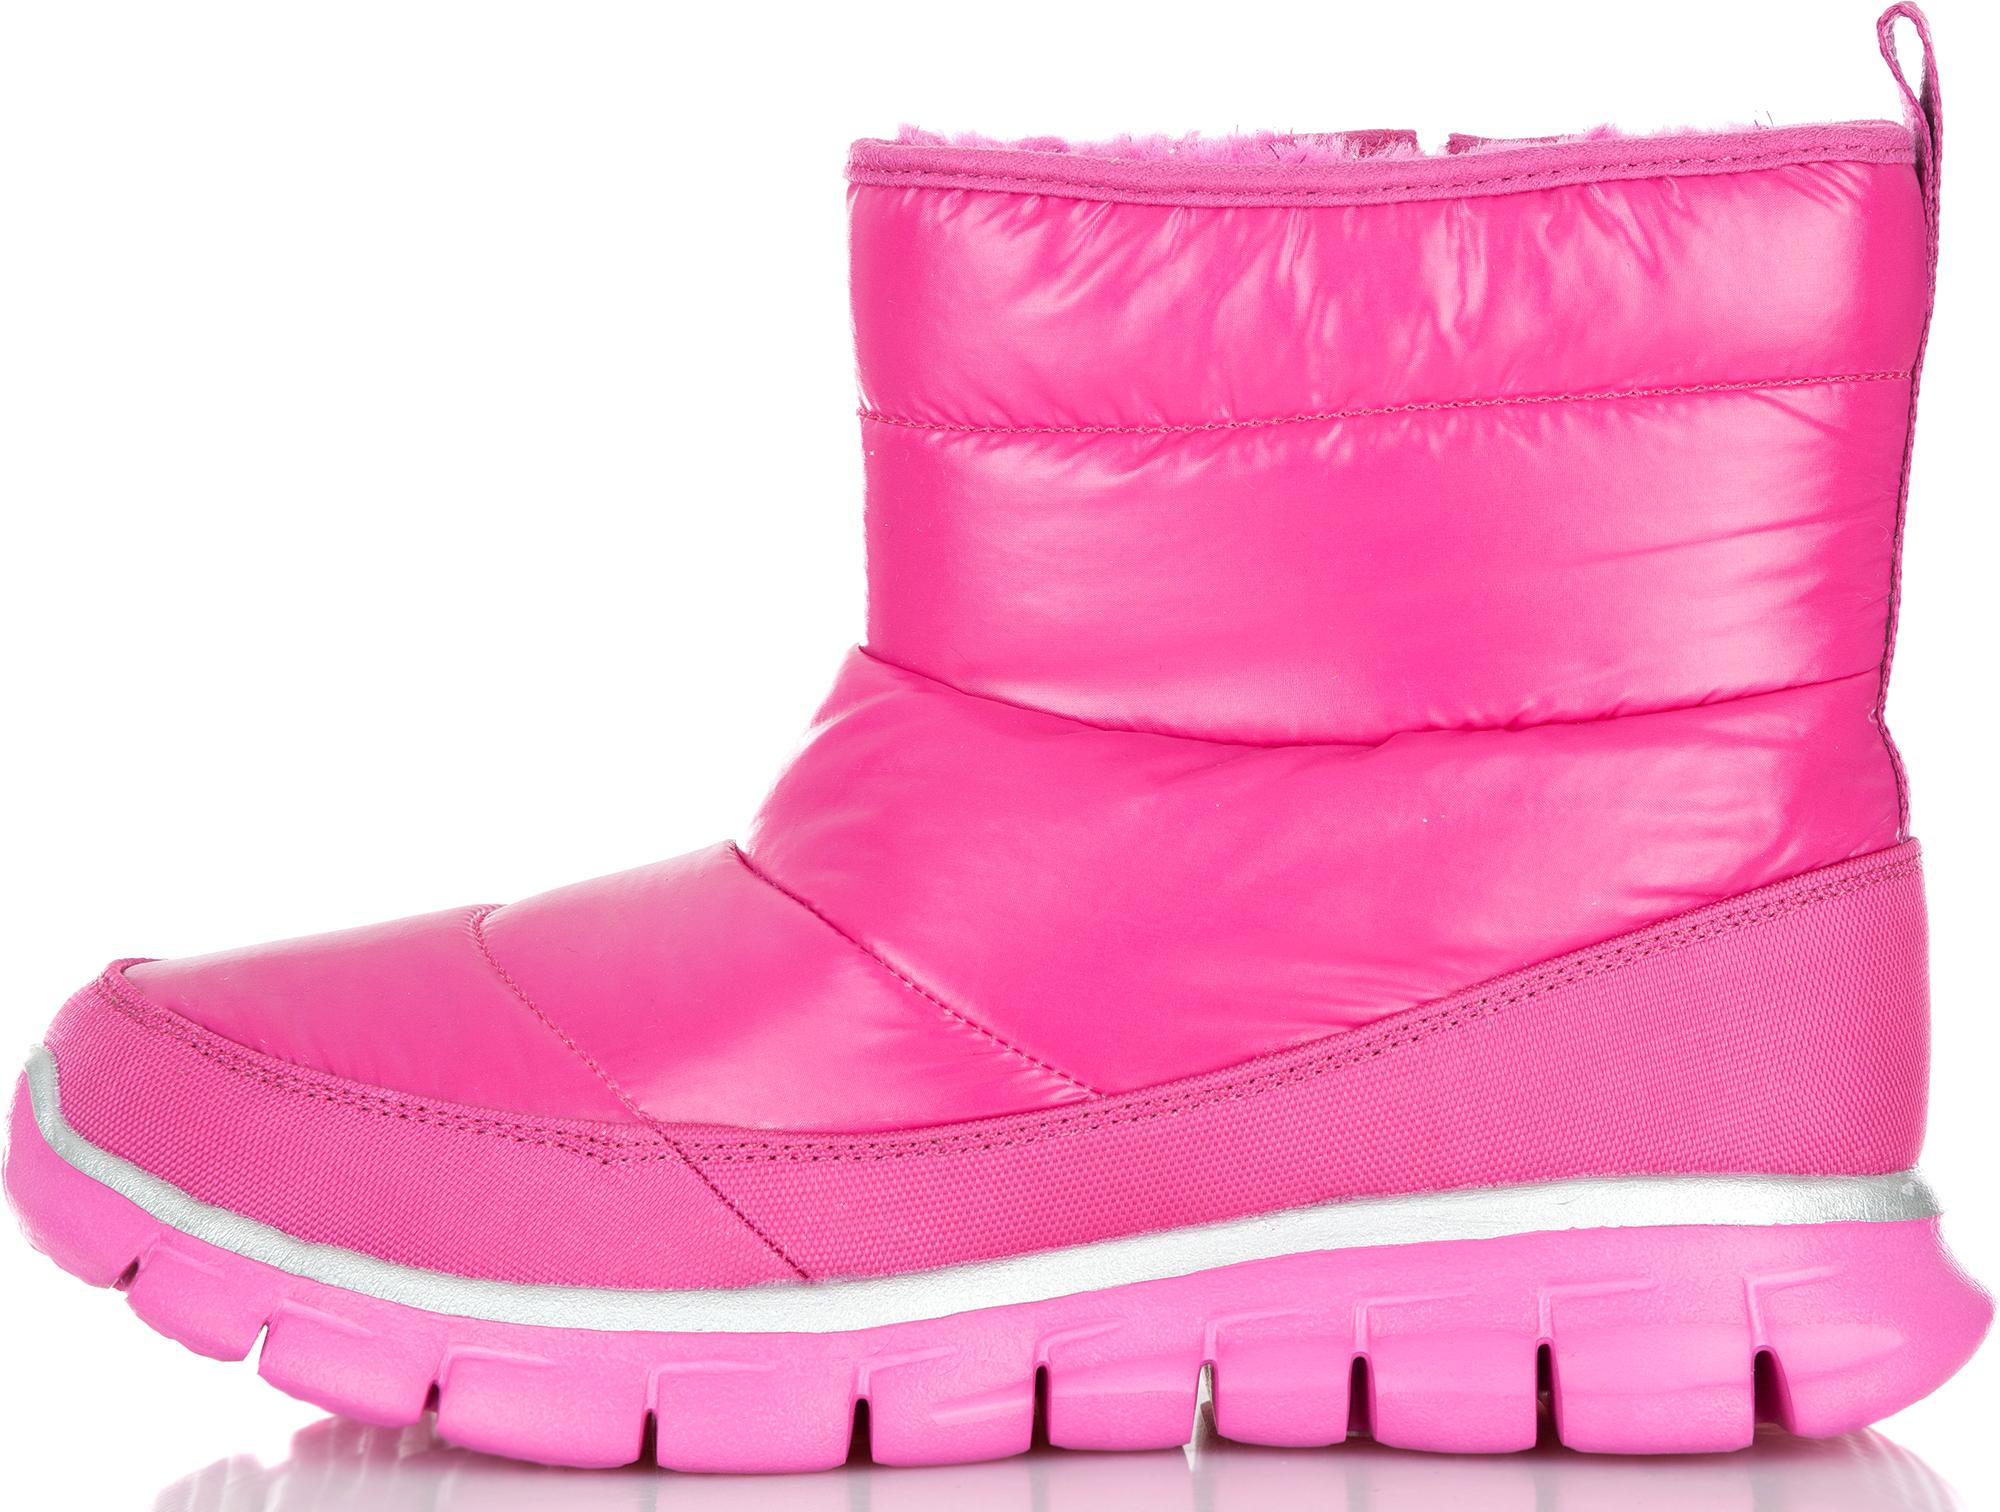 цена на Skechers Сапоги утепленные для девочек Skechers, размер 36